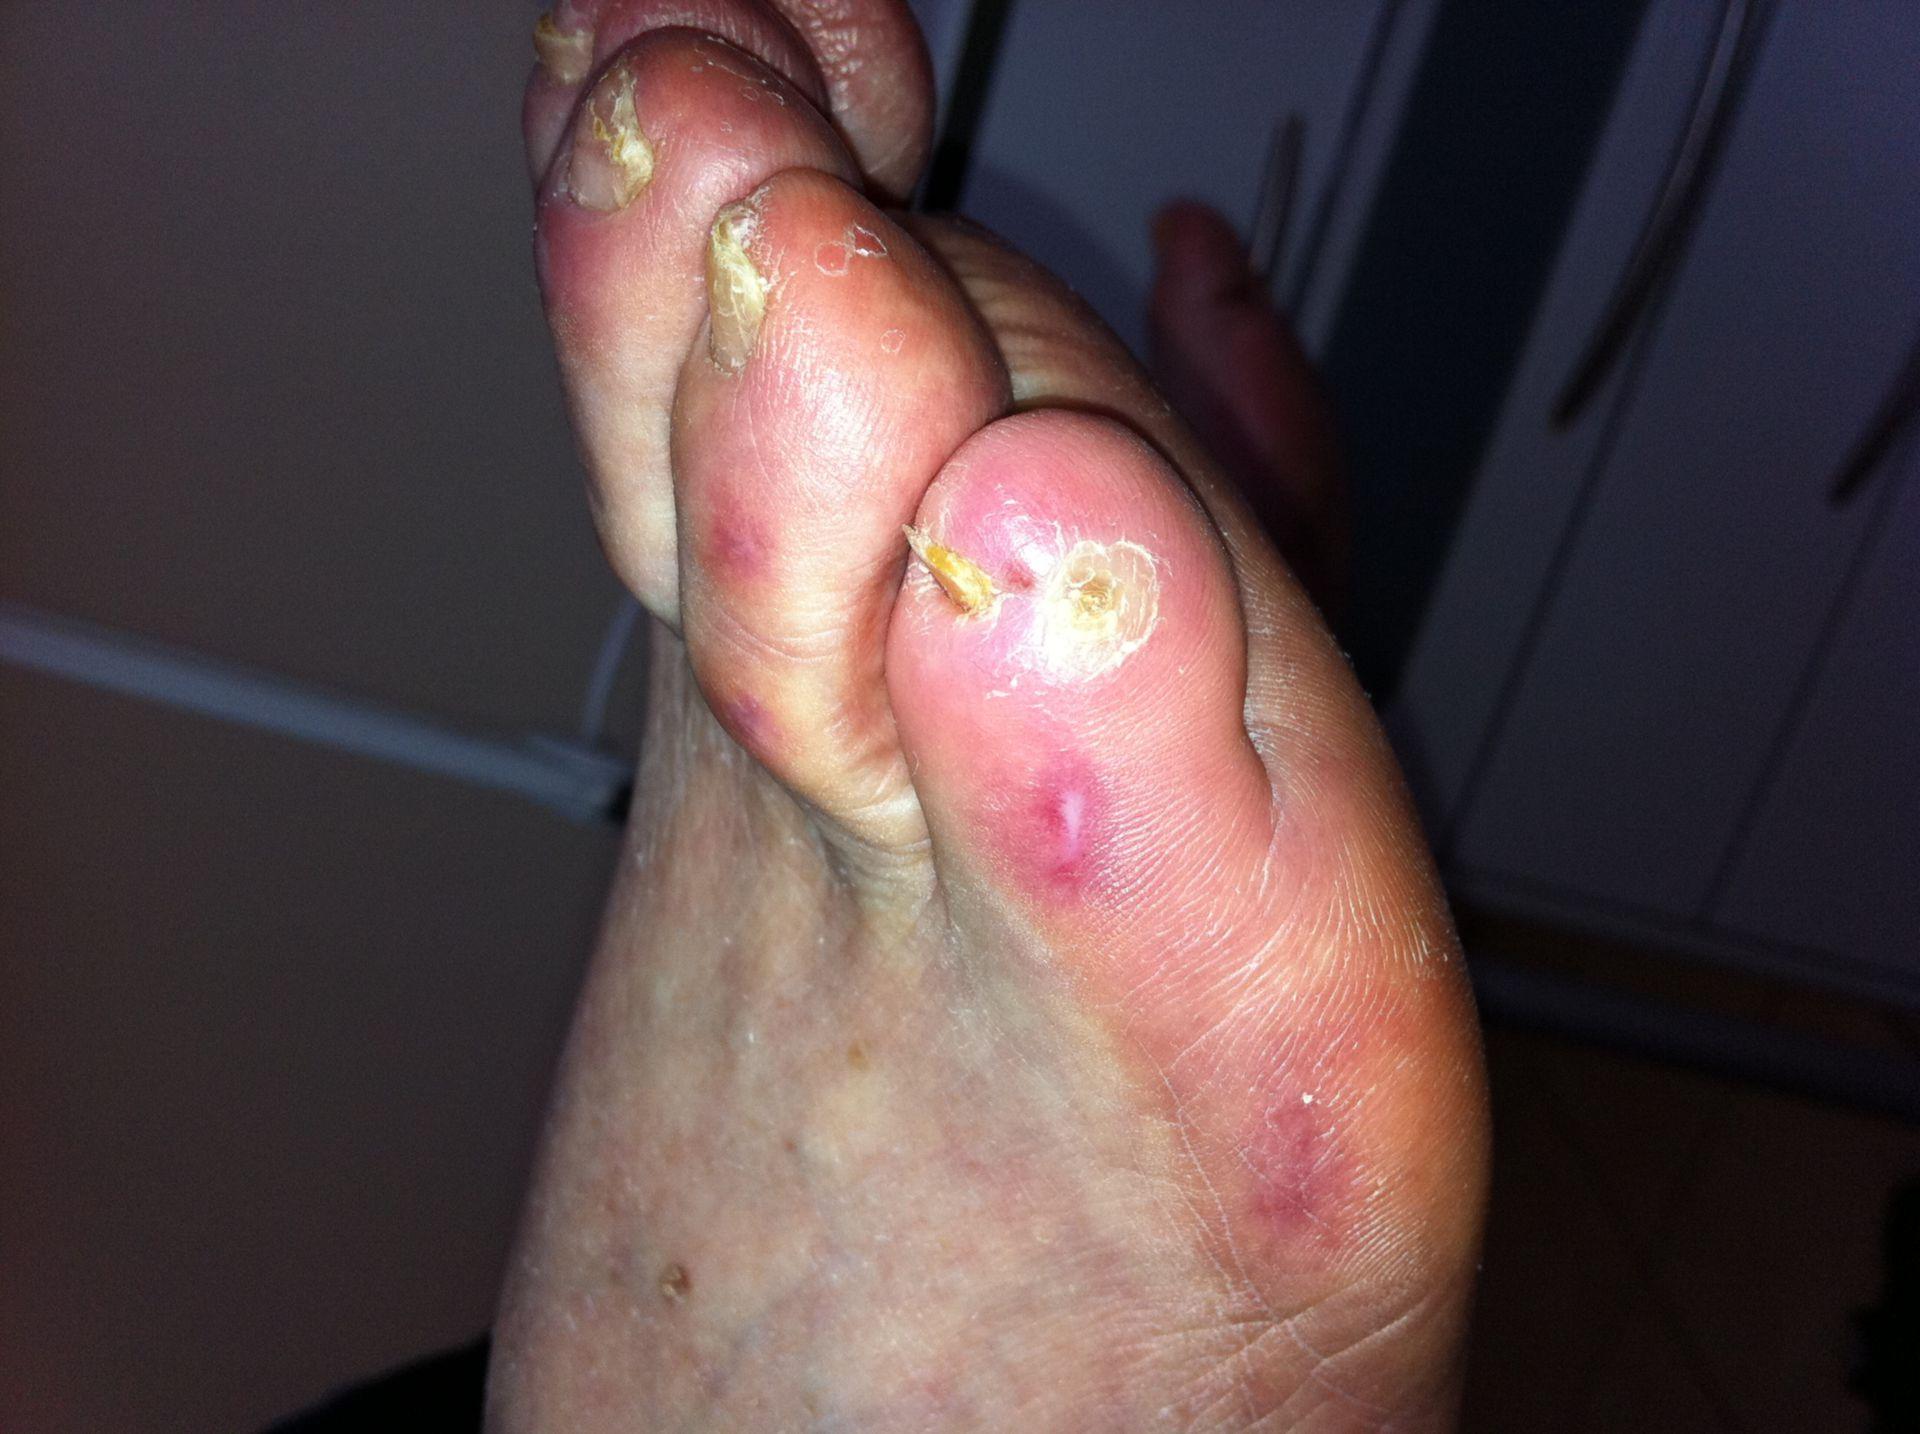 Malum perforans on the small toe